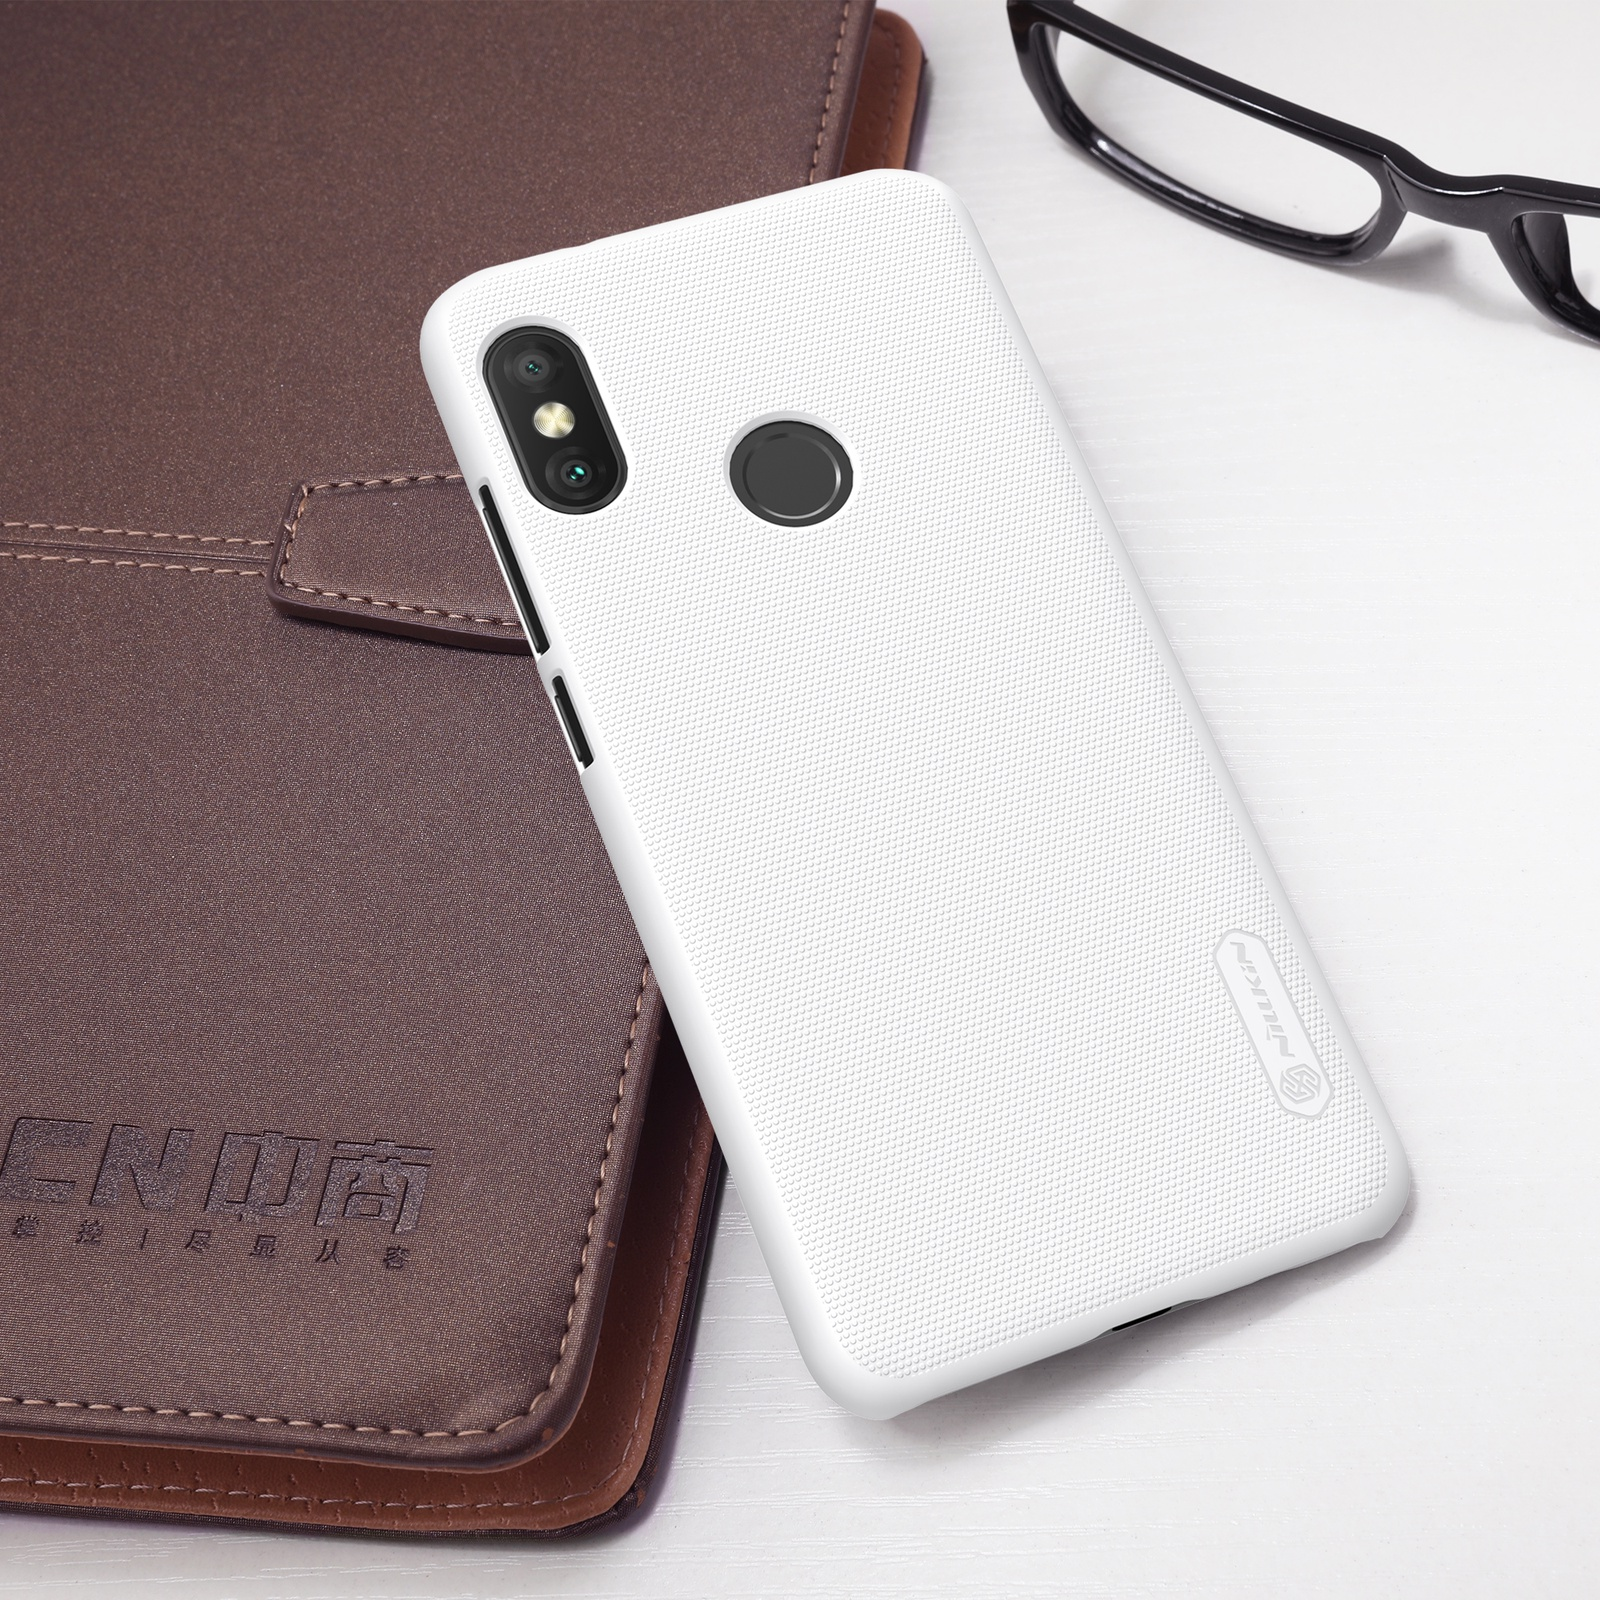 Чехол для сотового телефона Nillkin Накладка Frosted Xiaomi Redmi 6 Pro/Mi A2 Lite White, белый силиконовая накладка nillkin для xiaomi mi a2 white